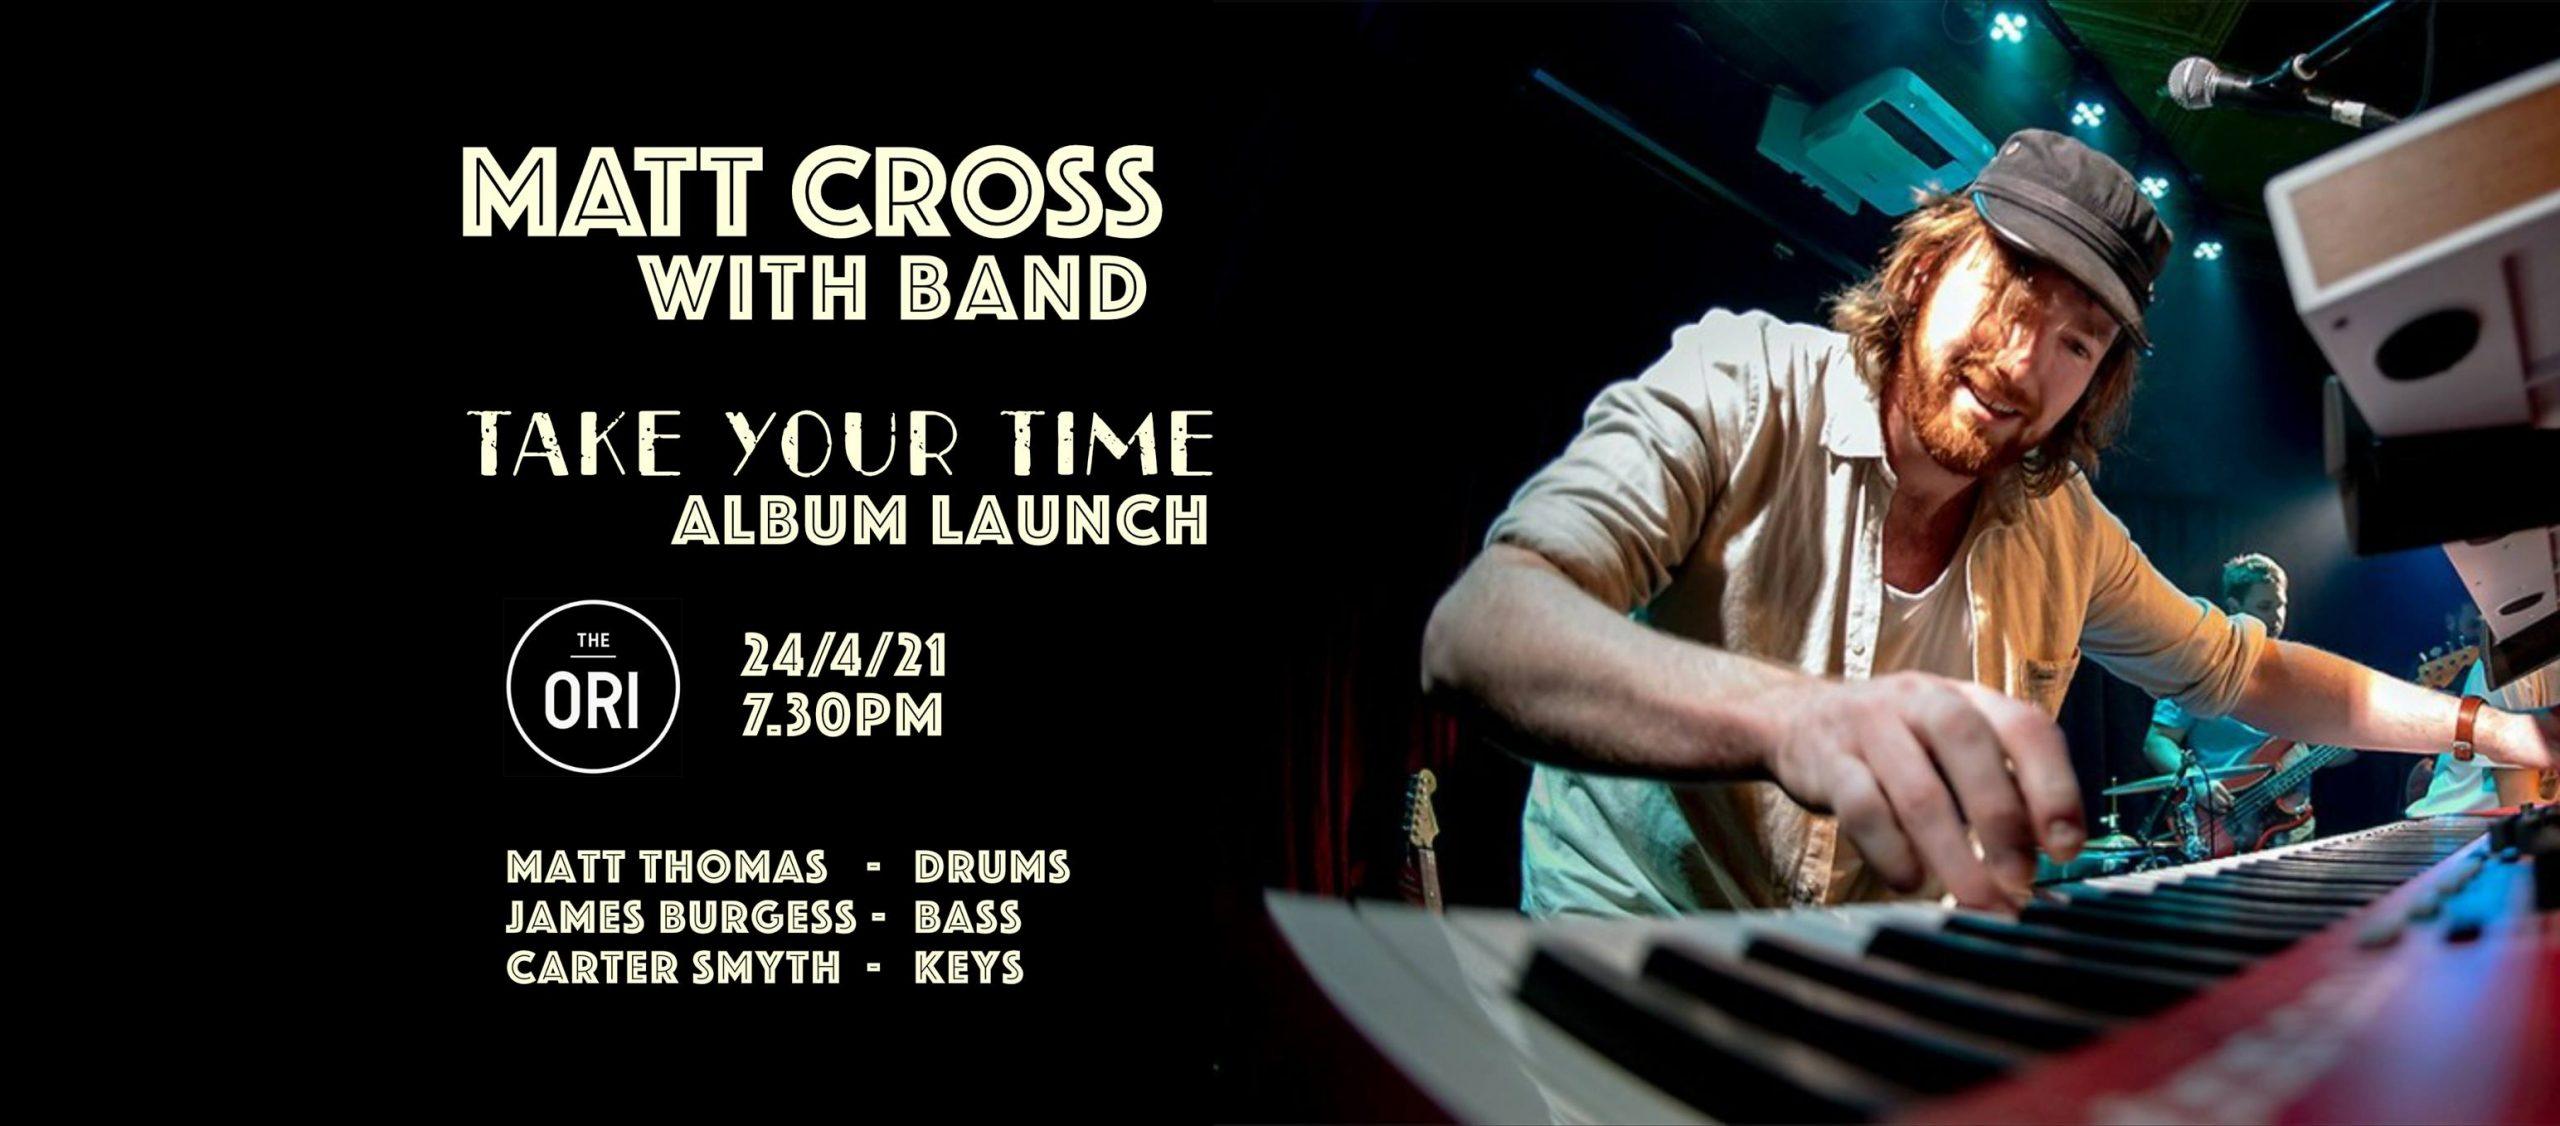 Matt Cross // Album Launch // The Ori